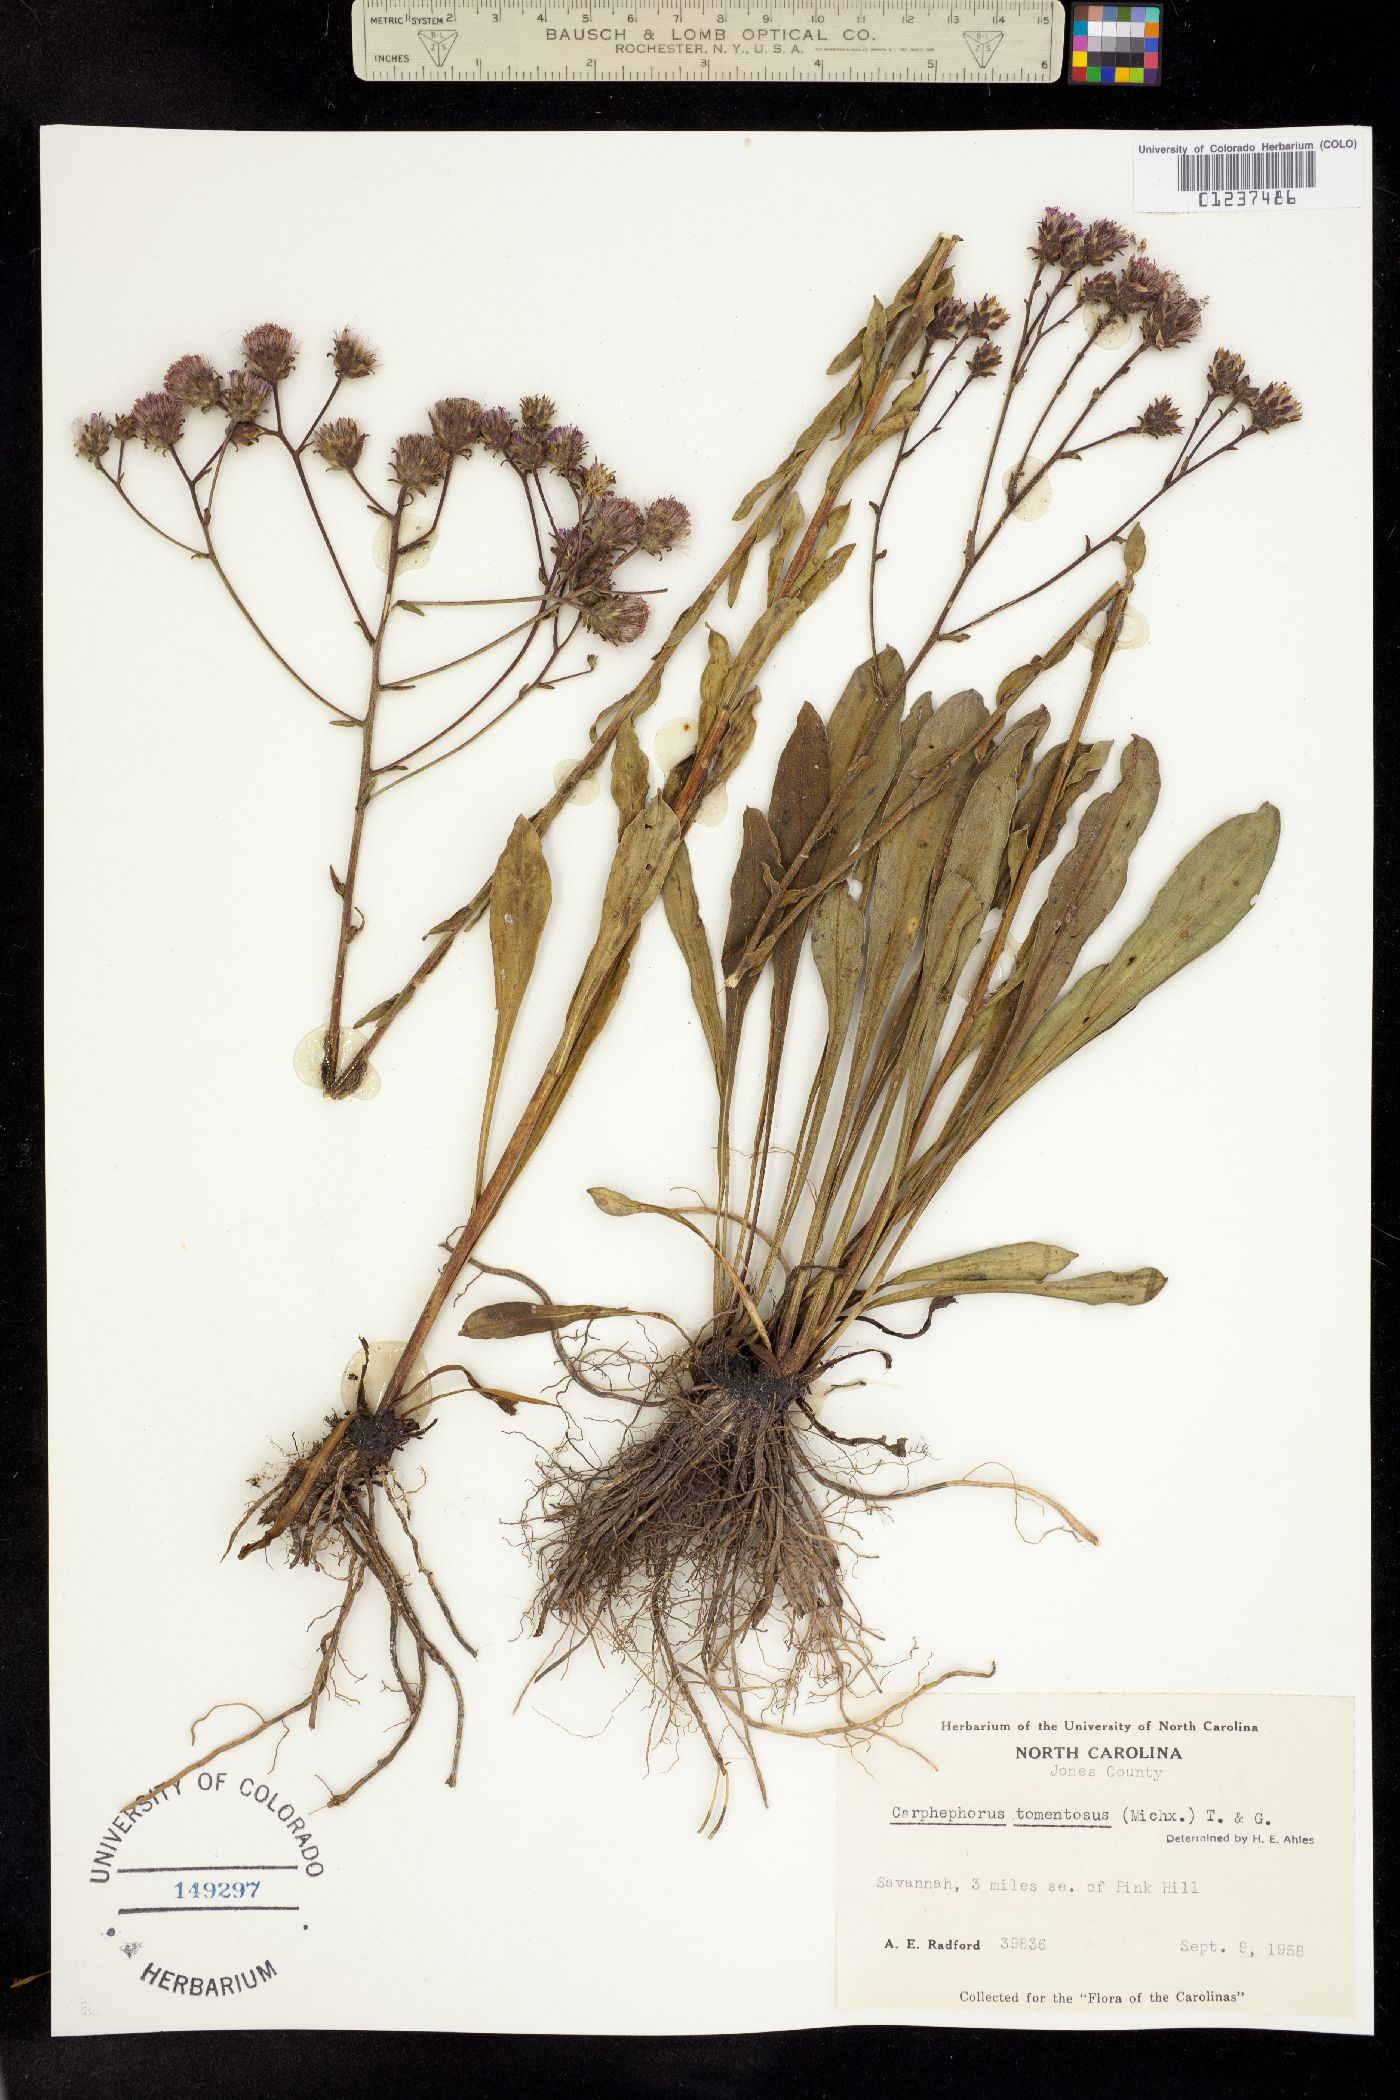 Carphephorus tomentosus image